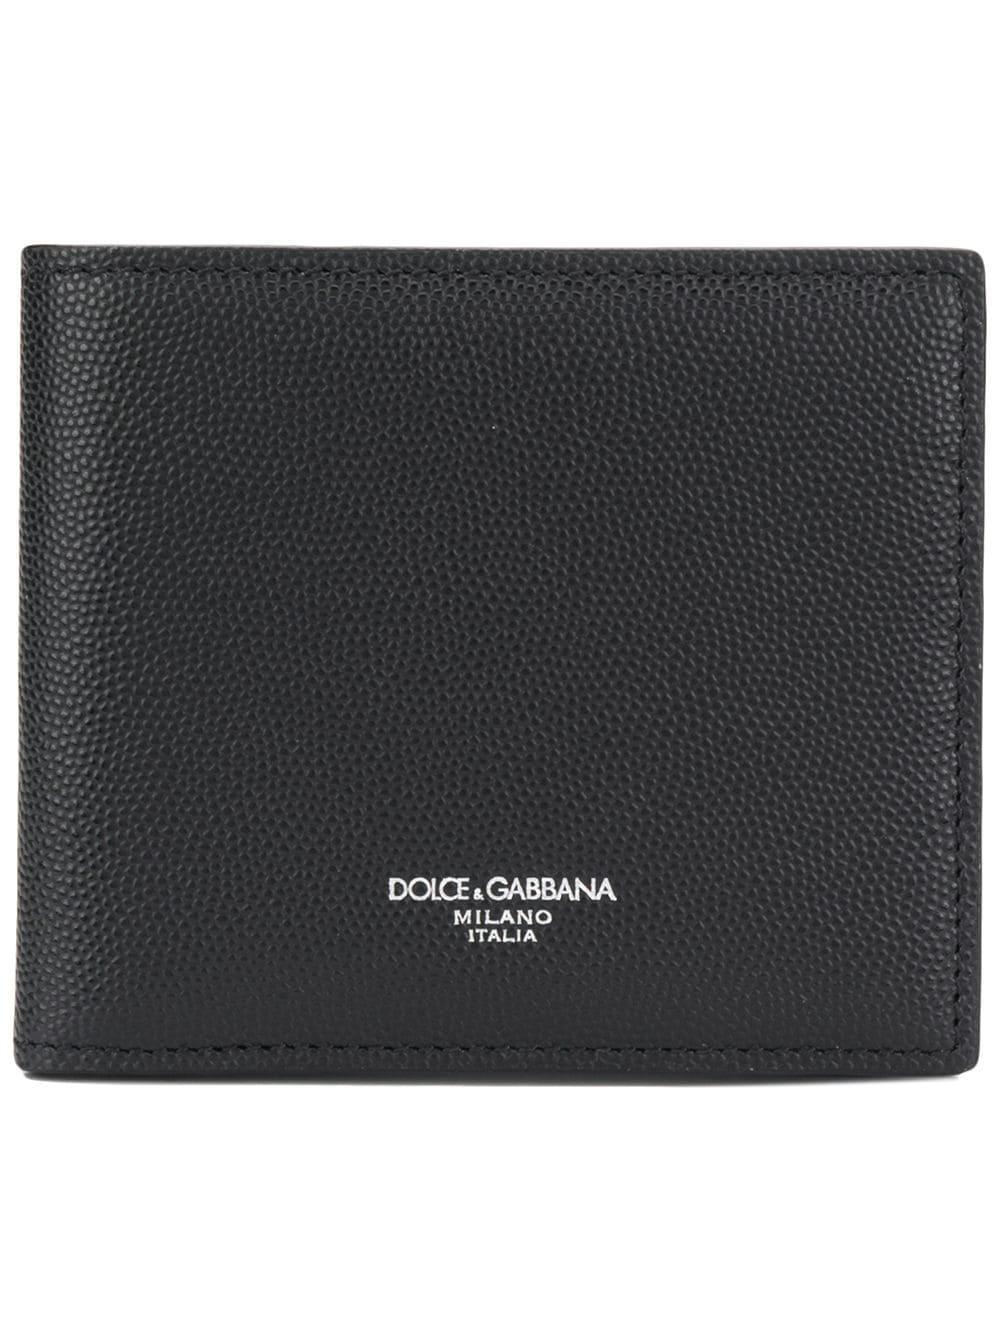 6049e06a79 Lyst - Dolce & Gabbana Sunshine Calf Wallet in Black for Men